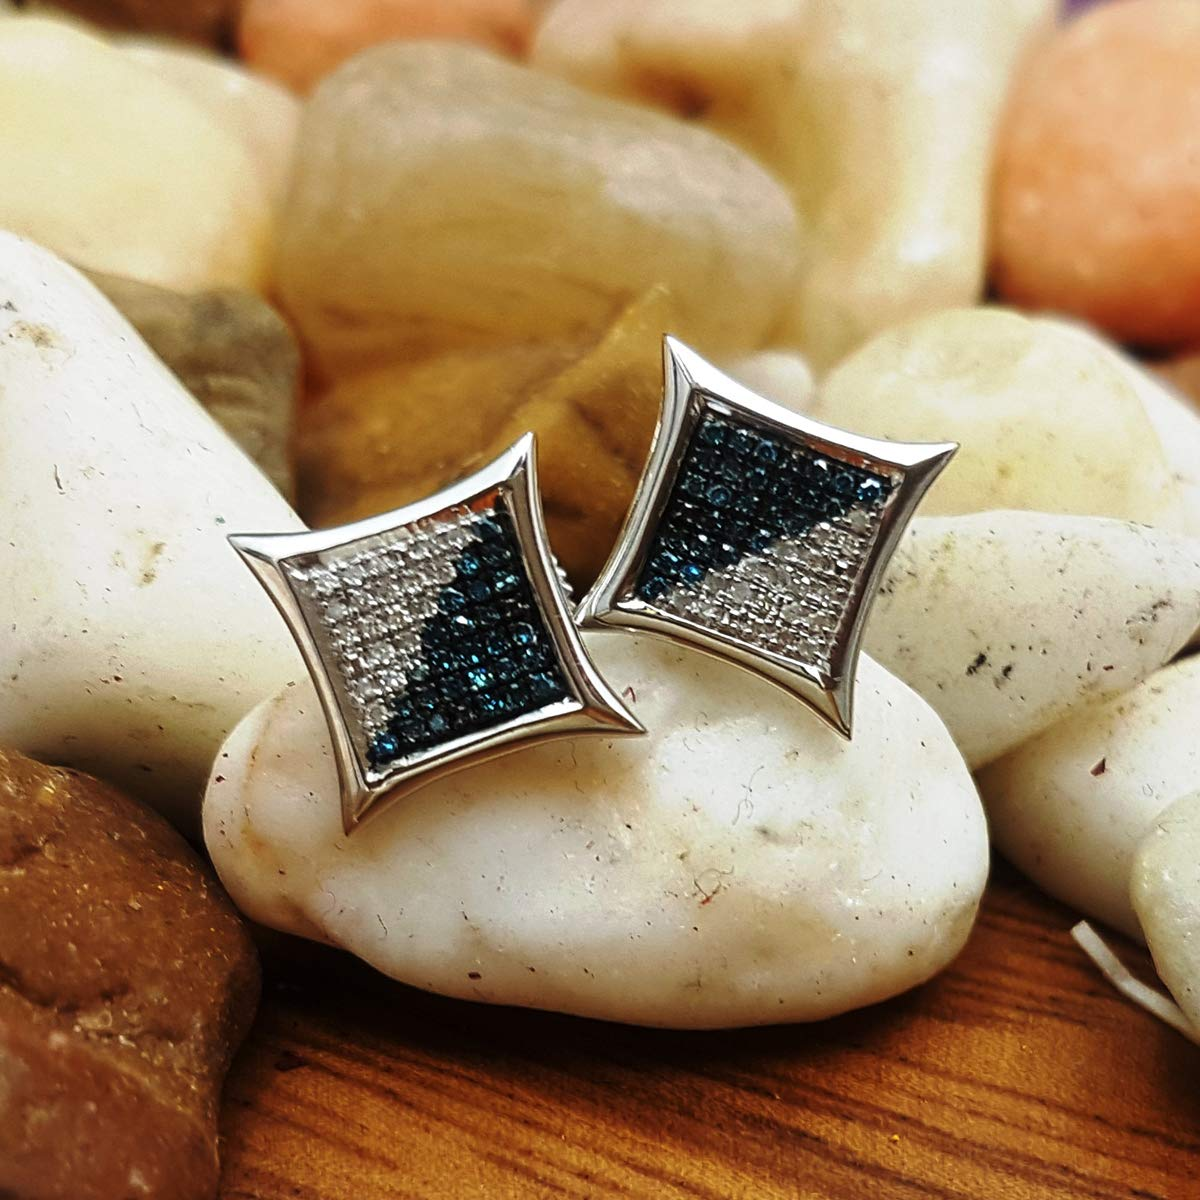 White /& Blue Round Diamond Micro Pave Setting Kite Shape Stud Earrings 1//4 CT ctw Dazzlingrock Collection 0.20 Carat